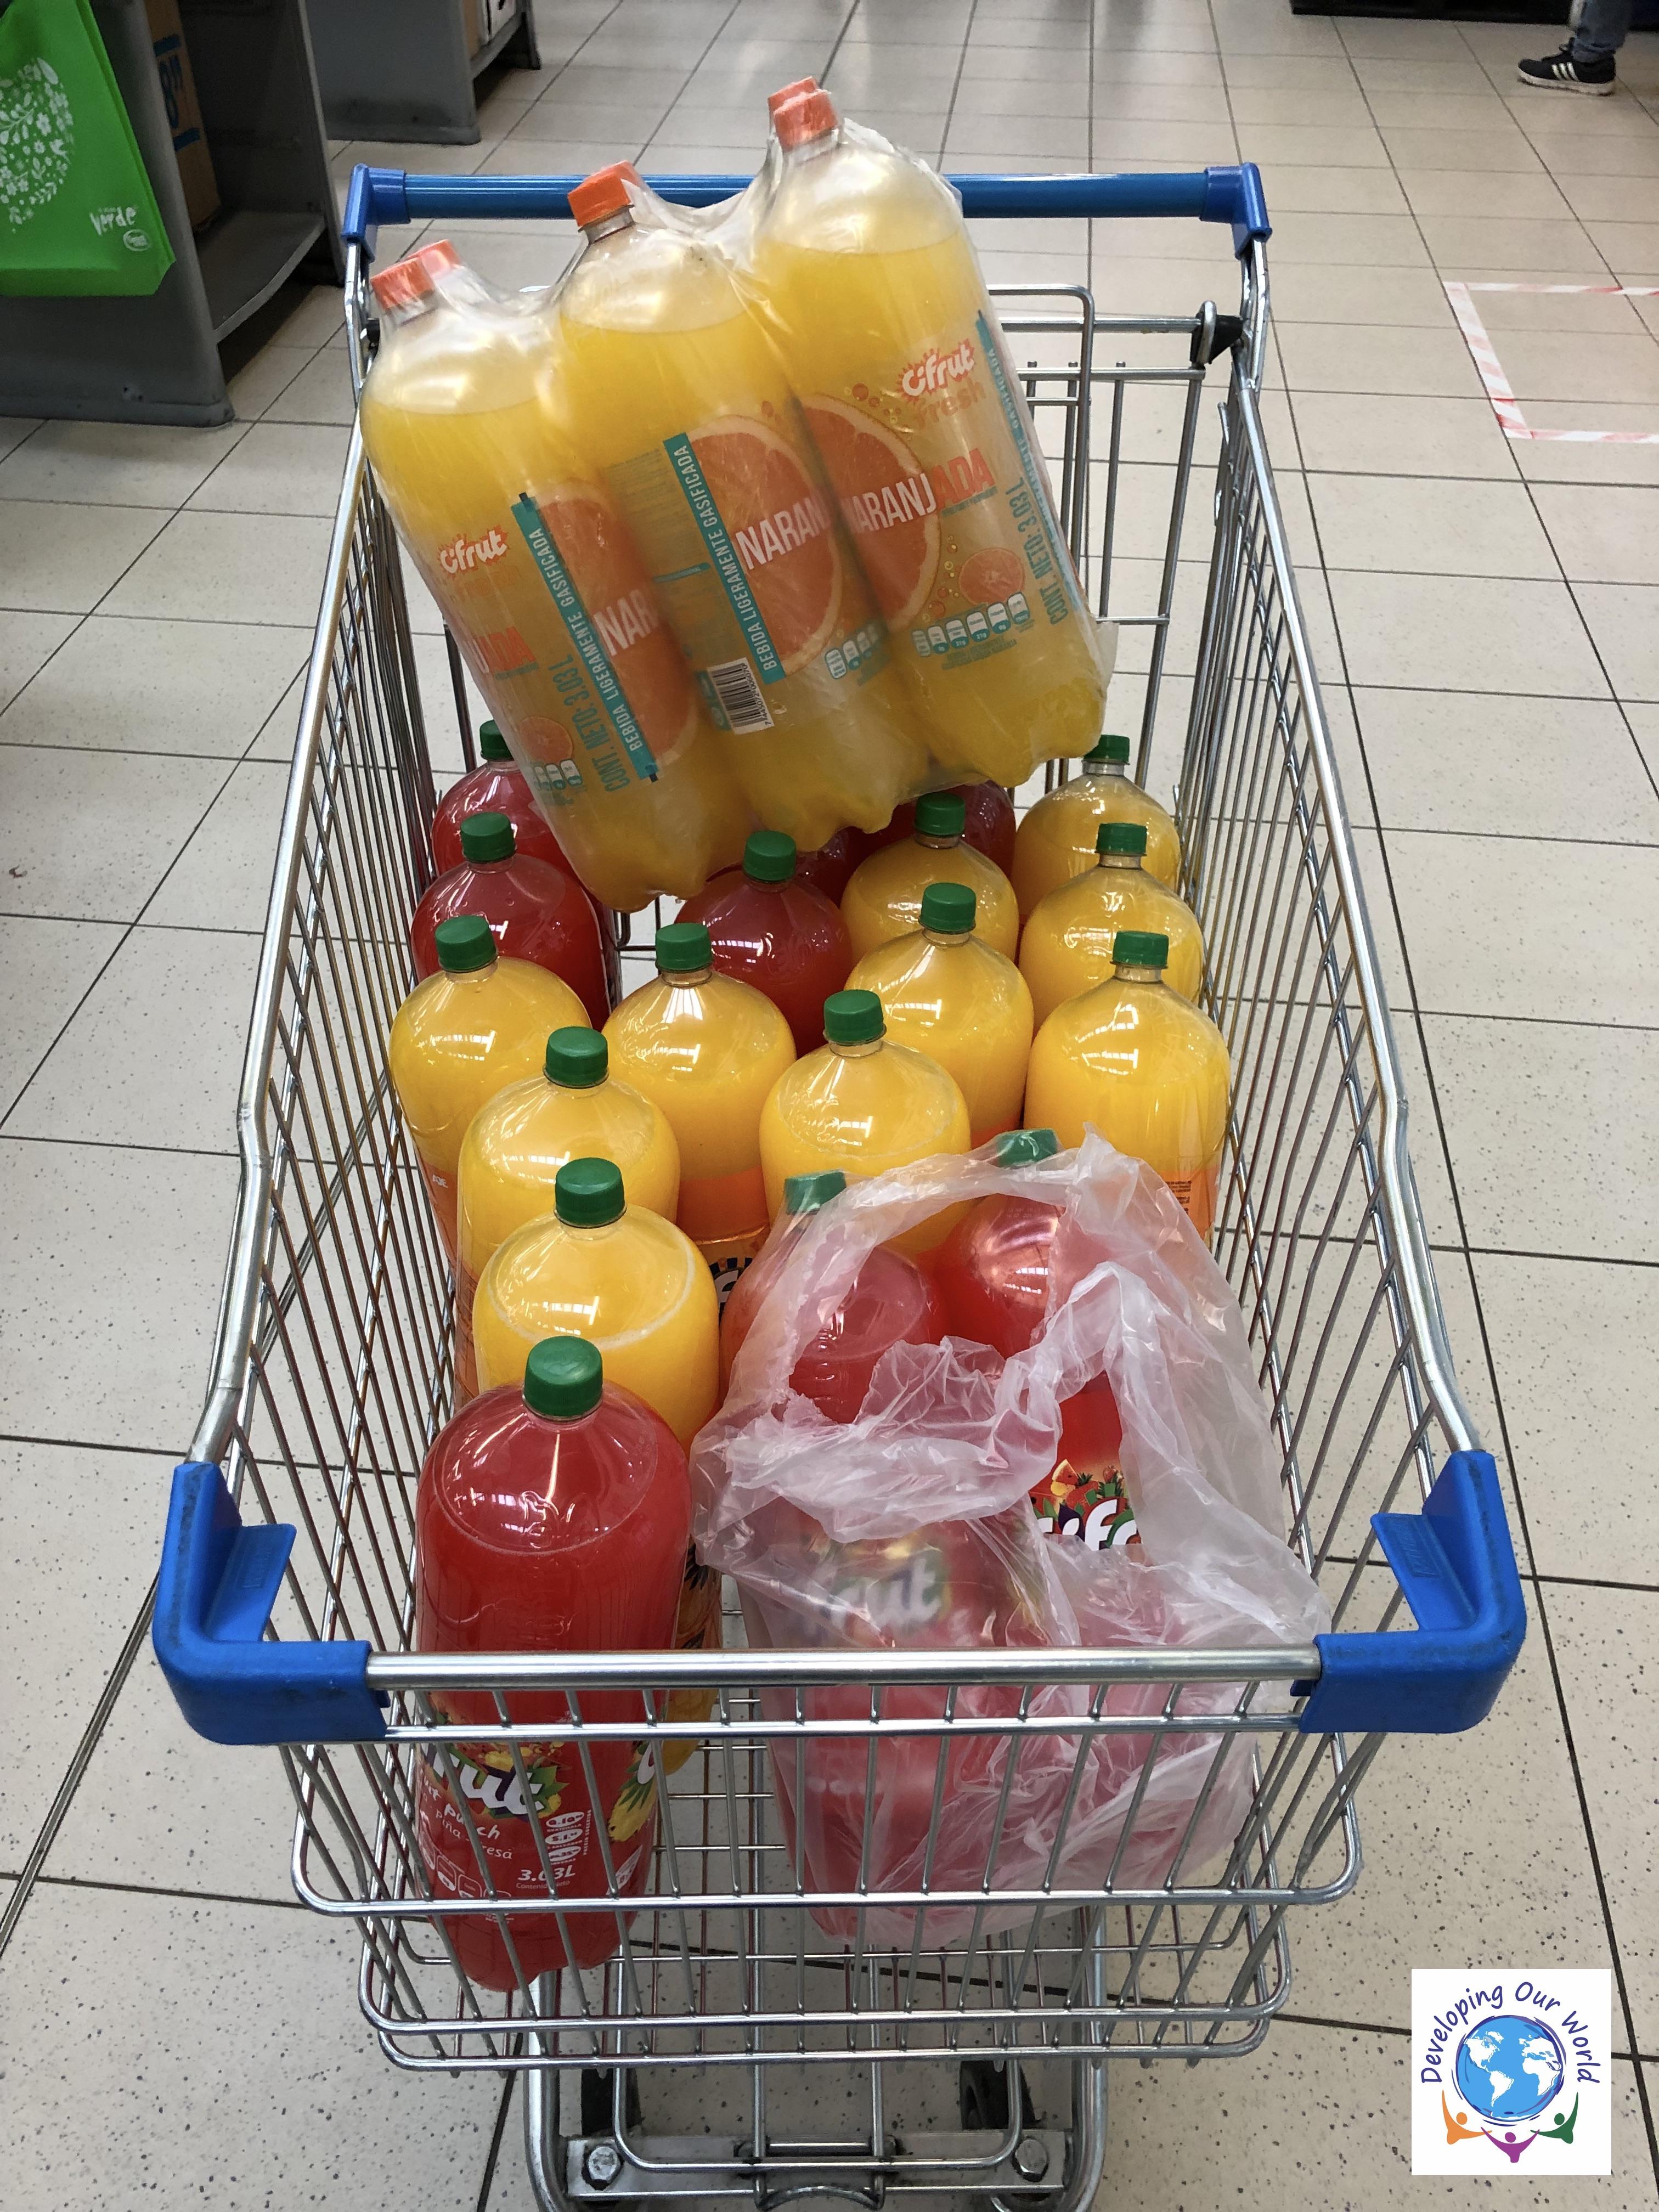 79 liters of orange and strawberry